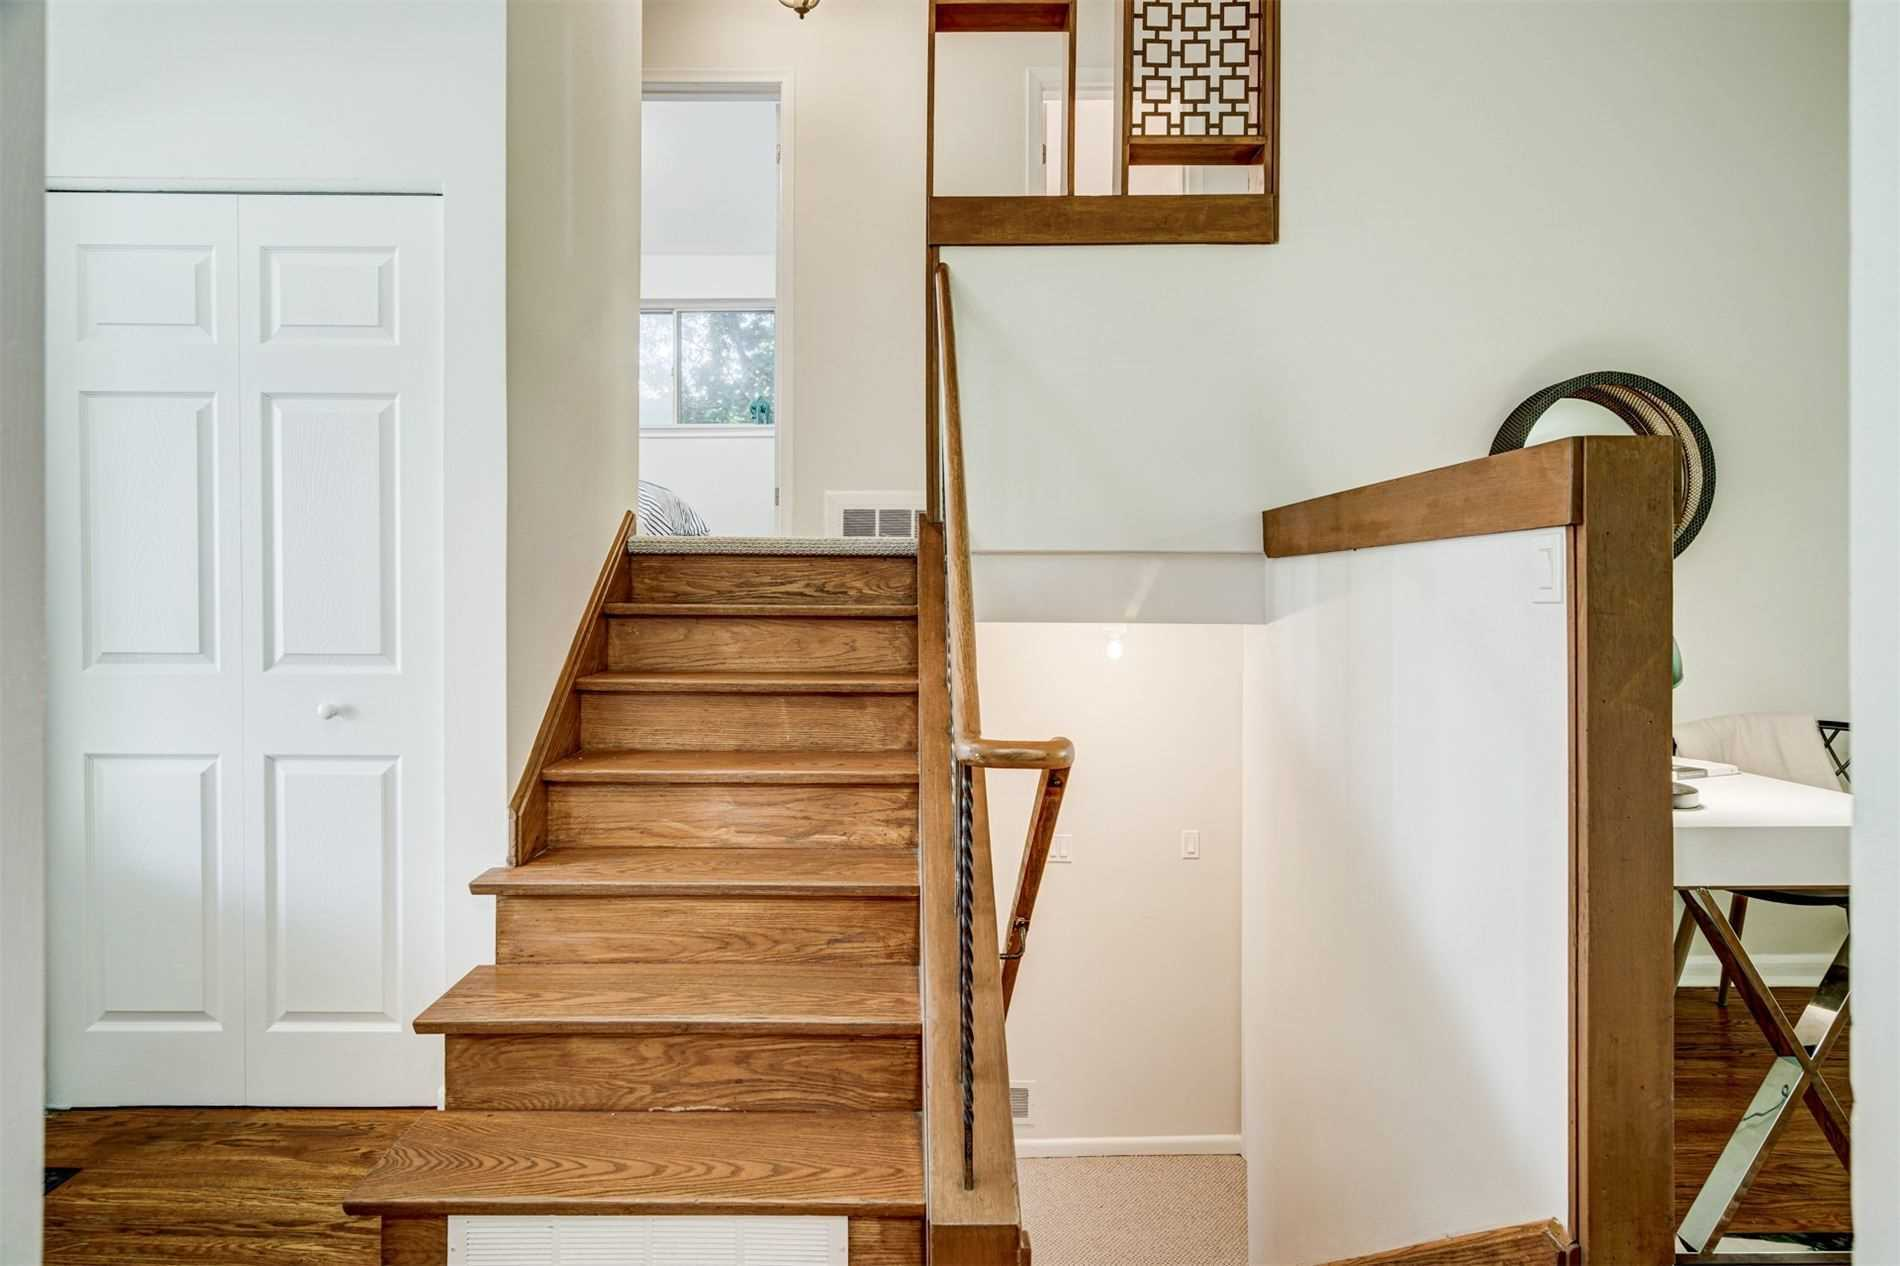 140 Verobeach Blvd - Humbermede Detached for sale, 3 Bedrooms (W5385046) - #15